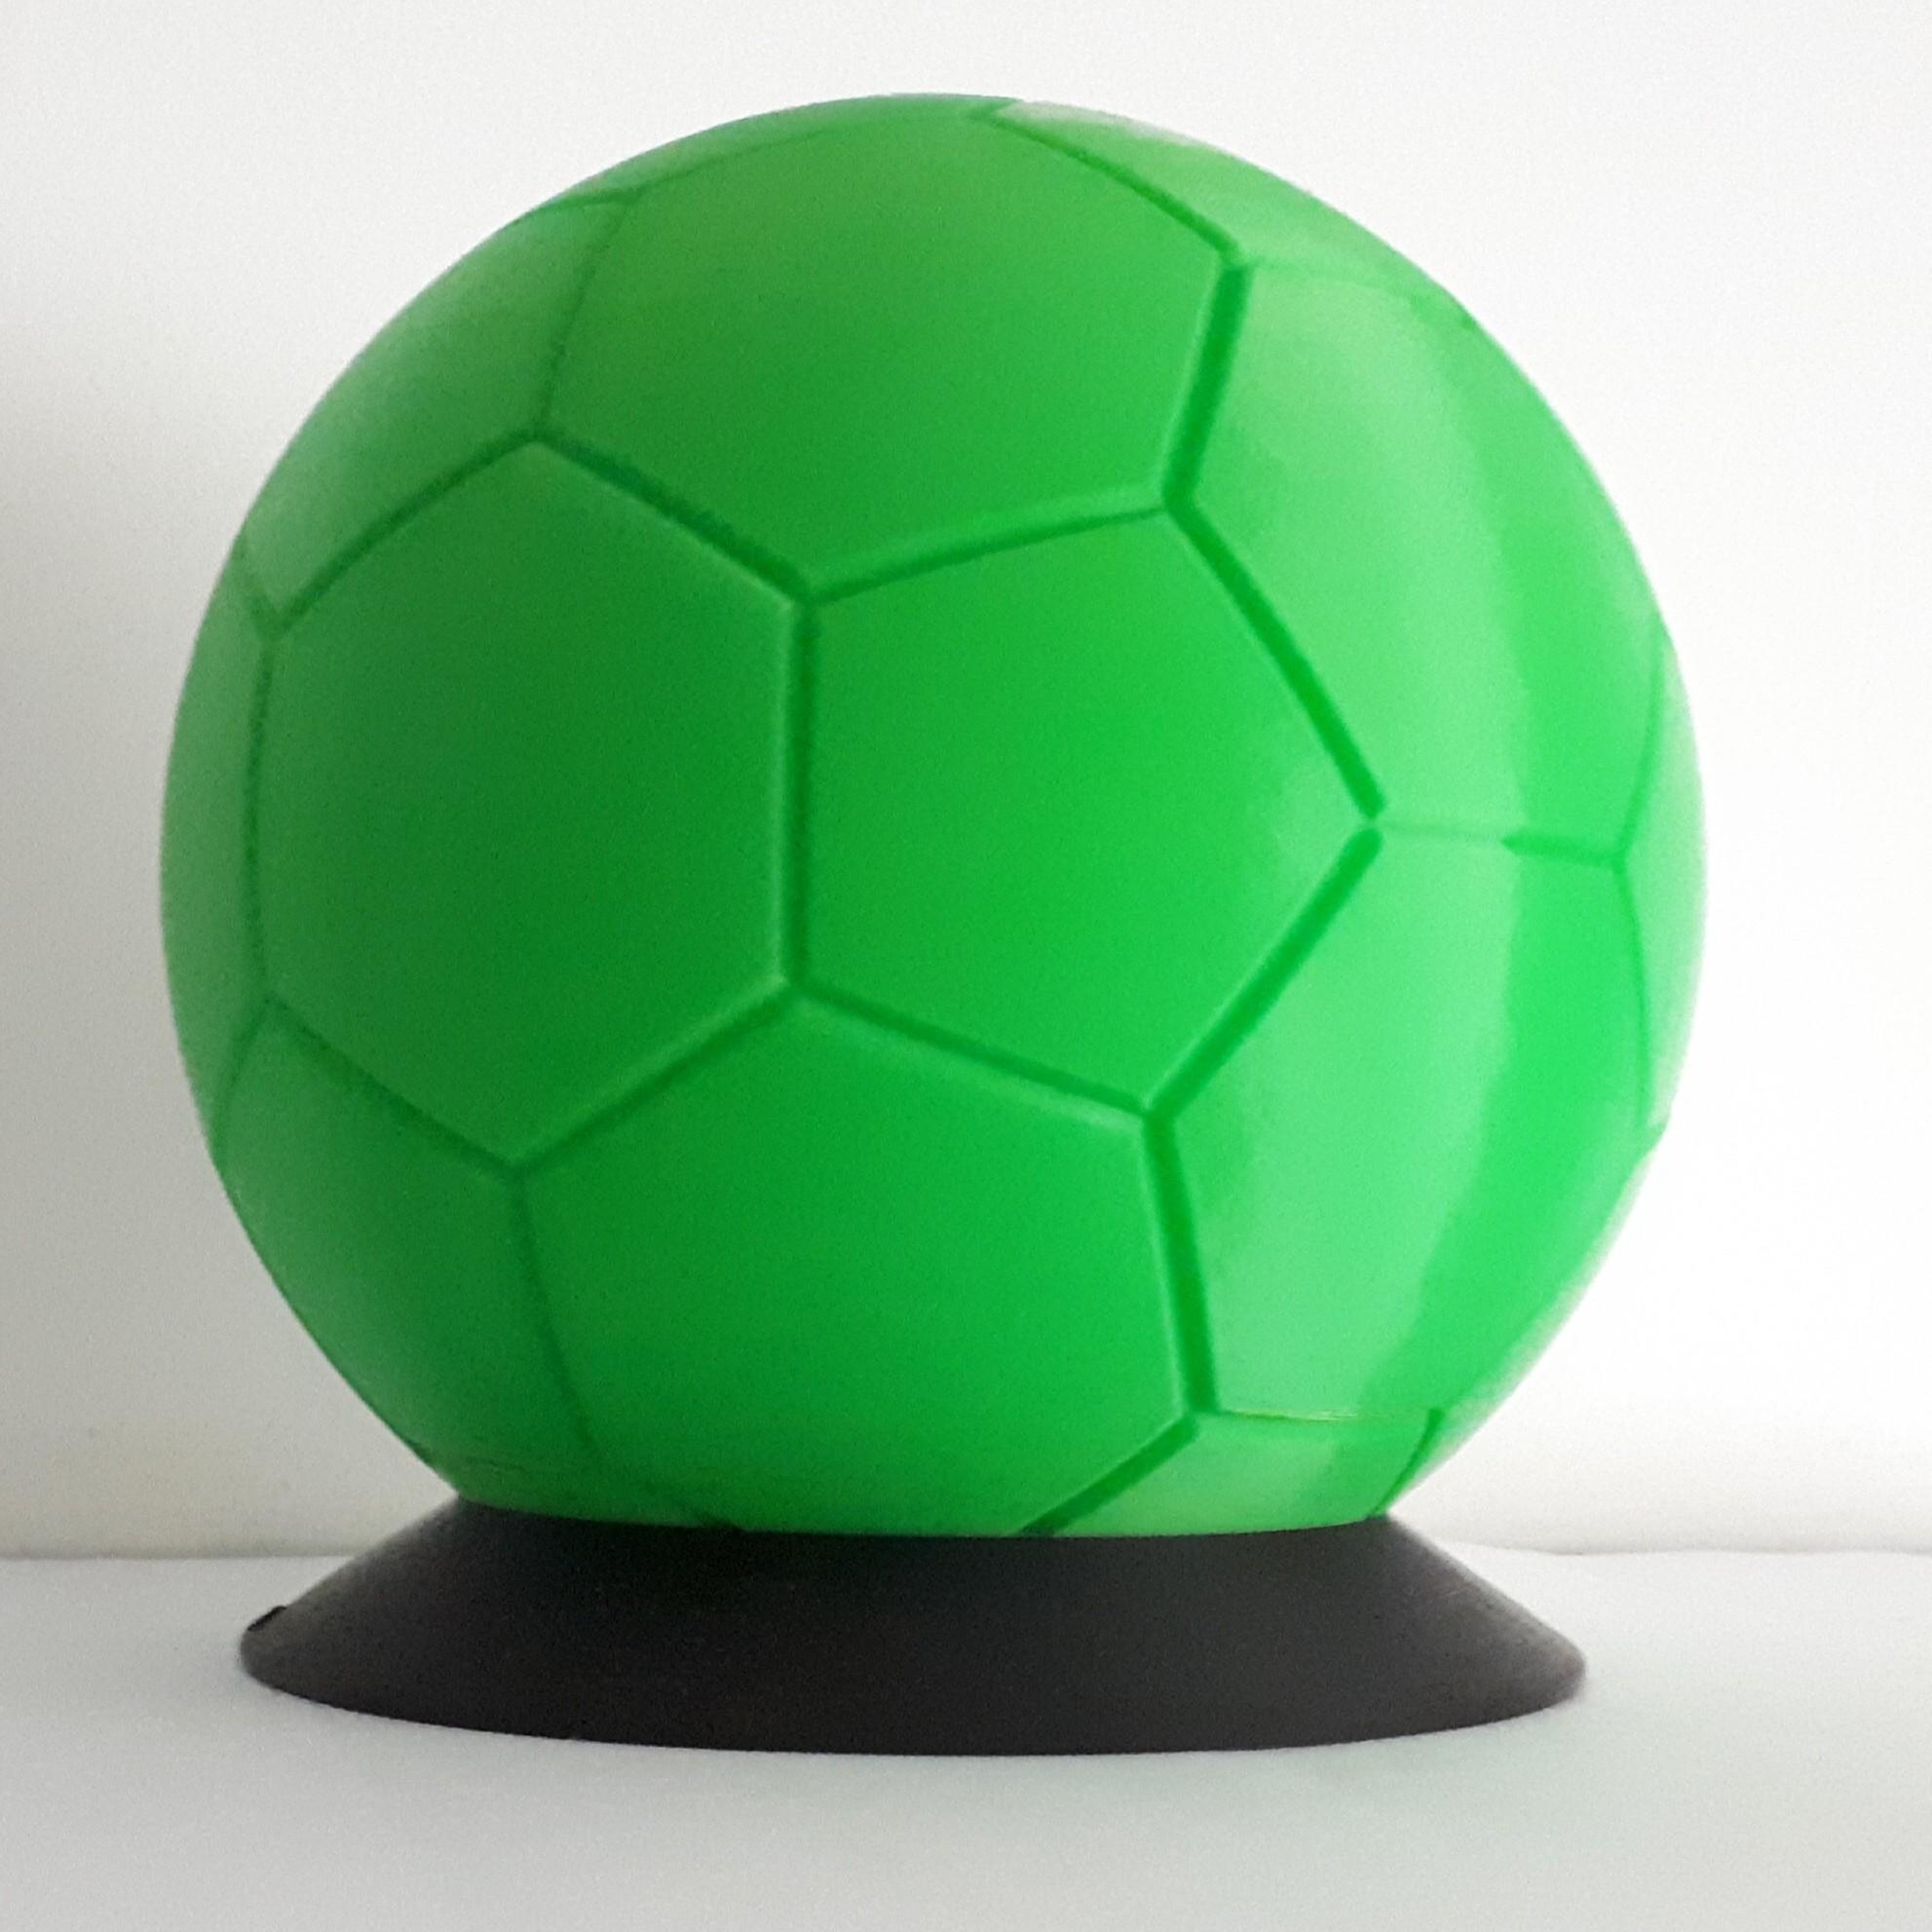 20180622_100856.jpg Download STL file Soccer Ball Money Box • Object to 3D print, manrod3d